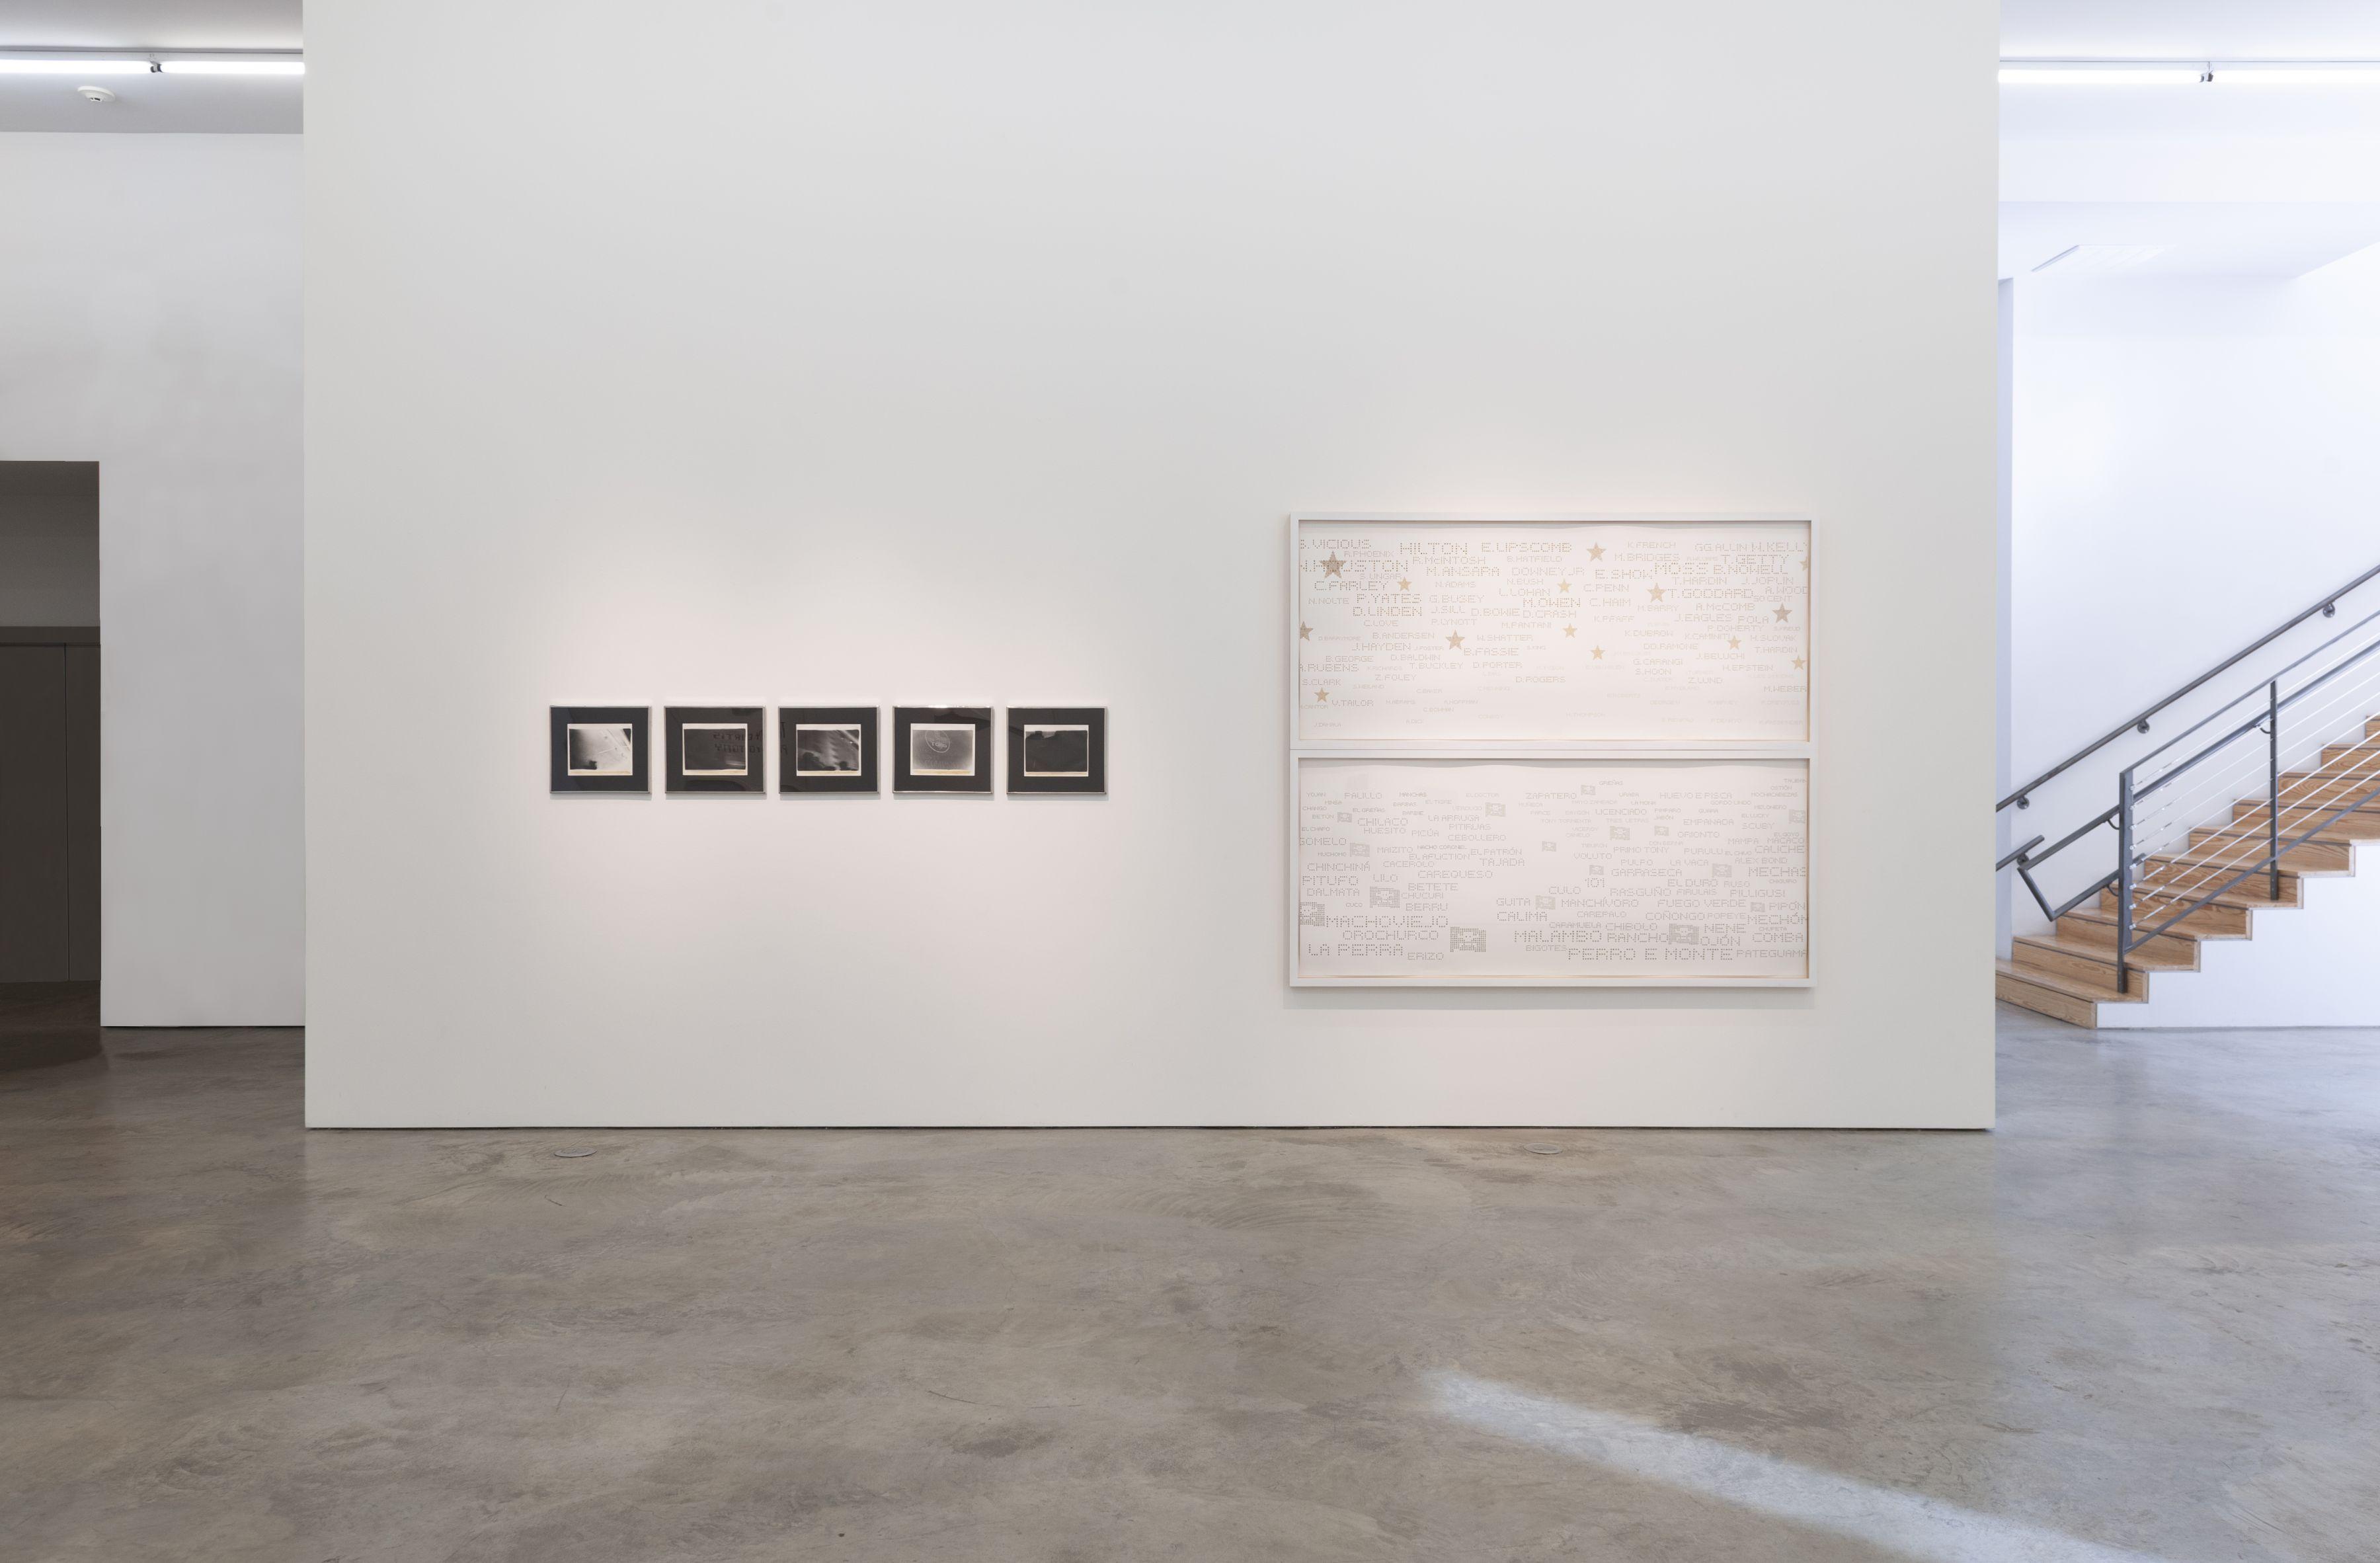 Miguel Ángel Rojas,Greed and Desire.Sicardi | Ayers | Bacino, 2018